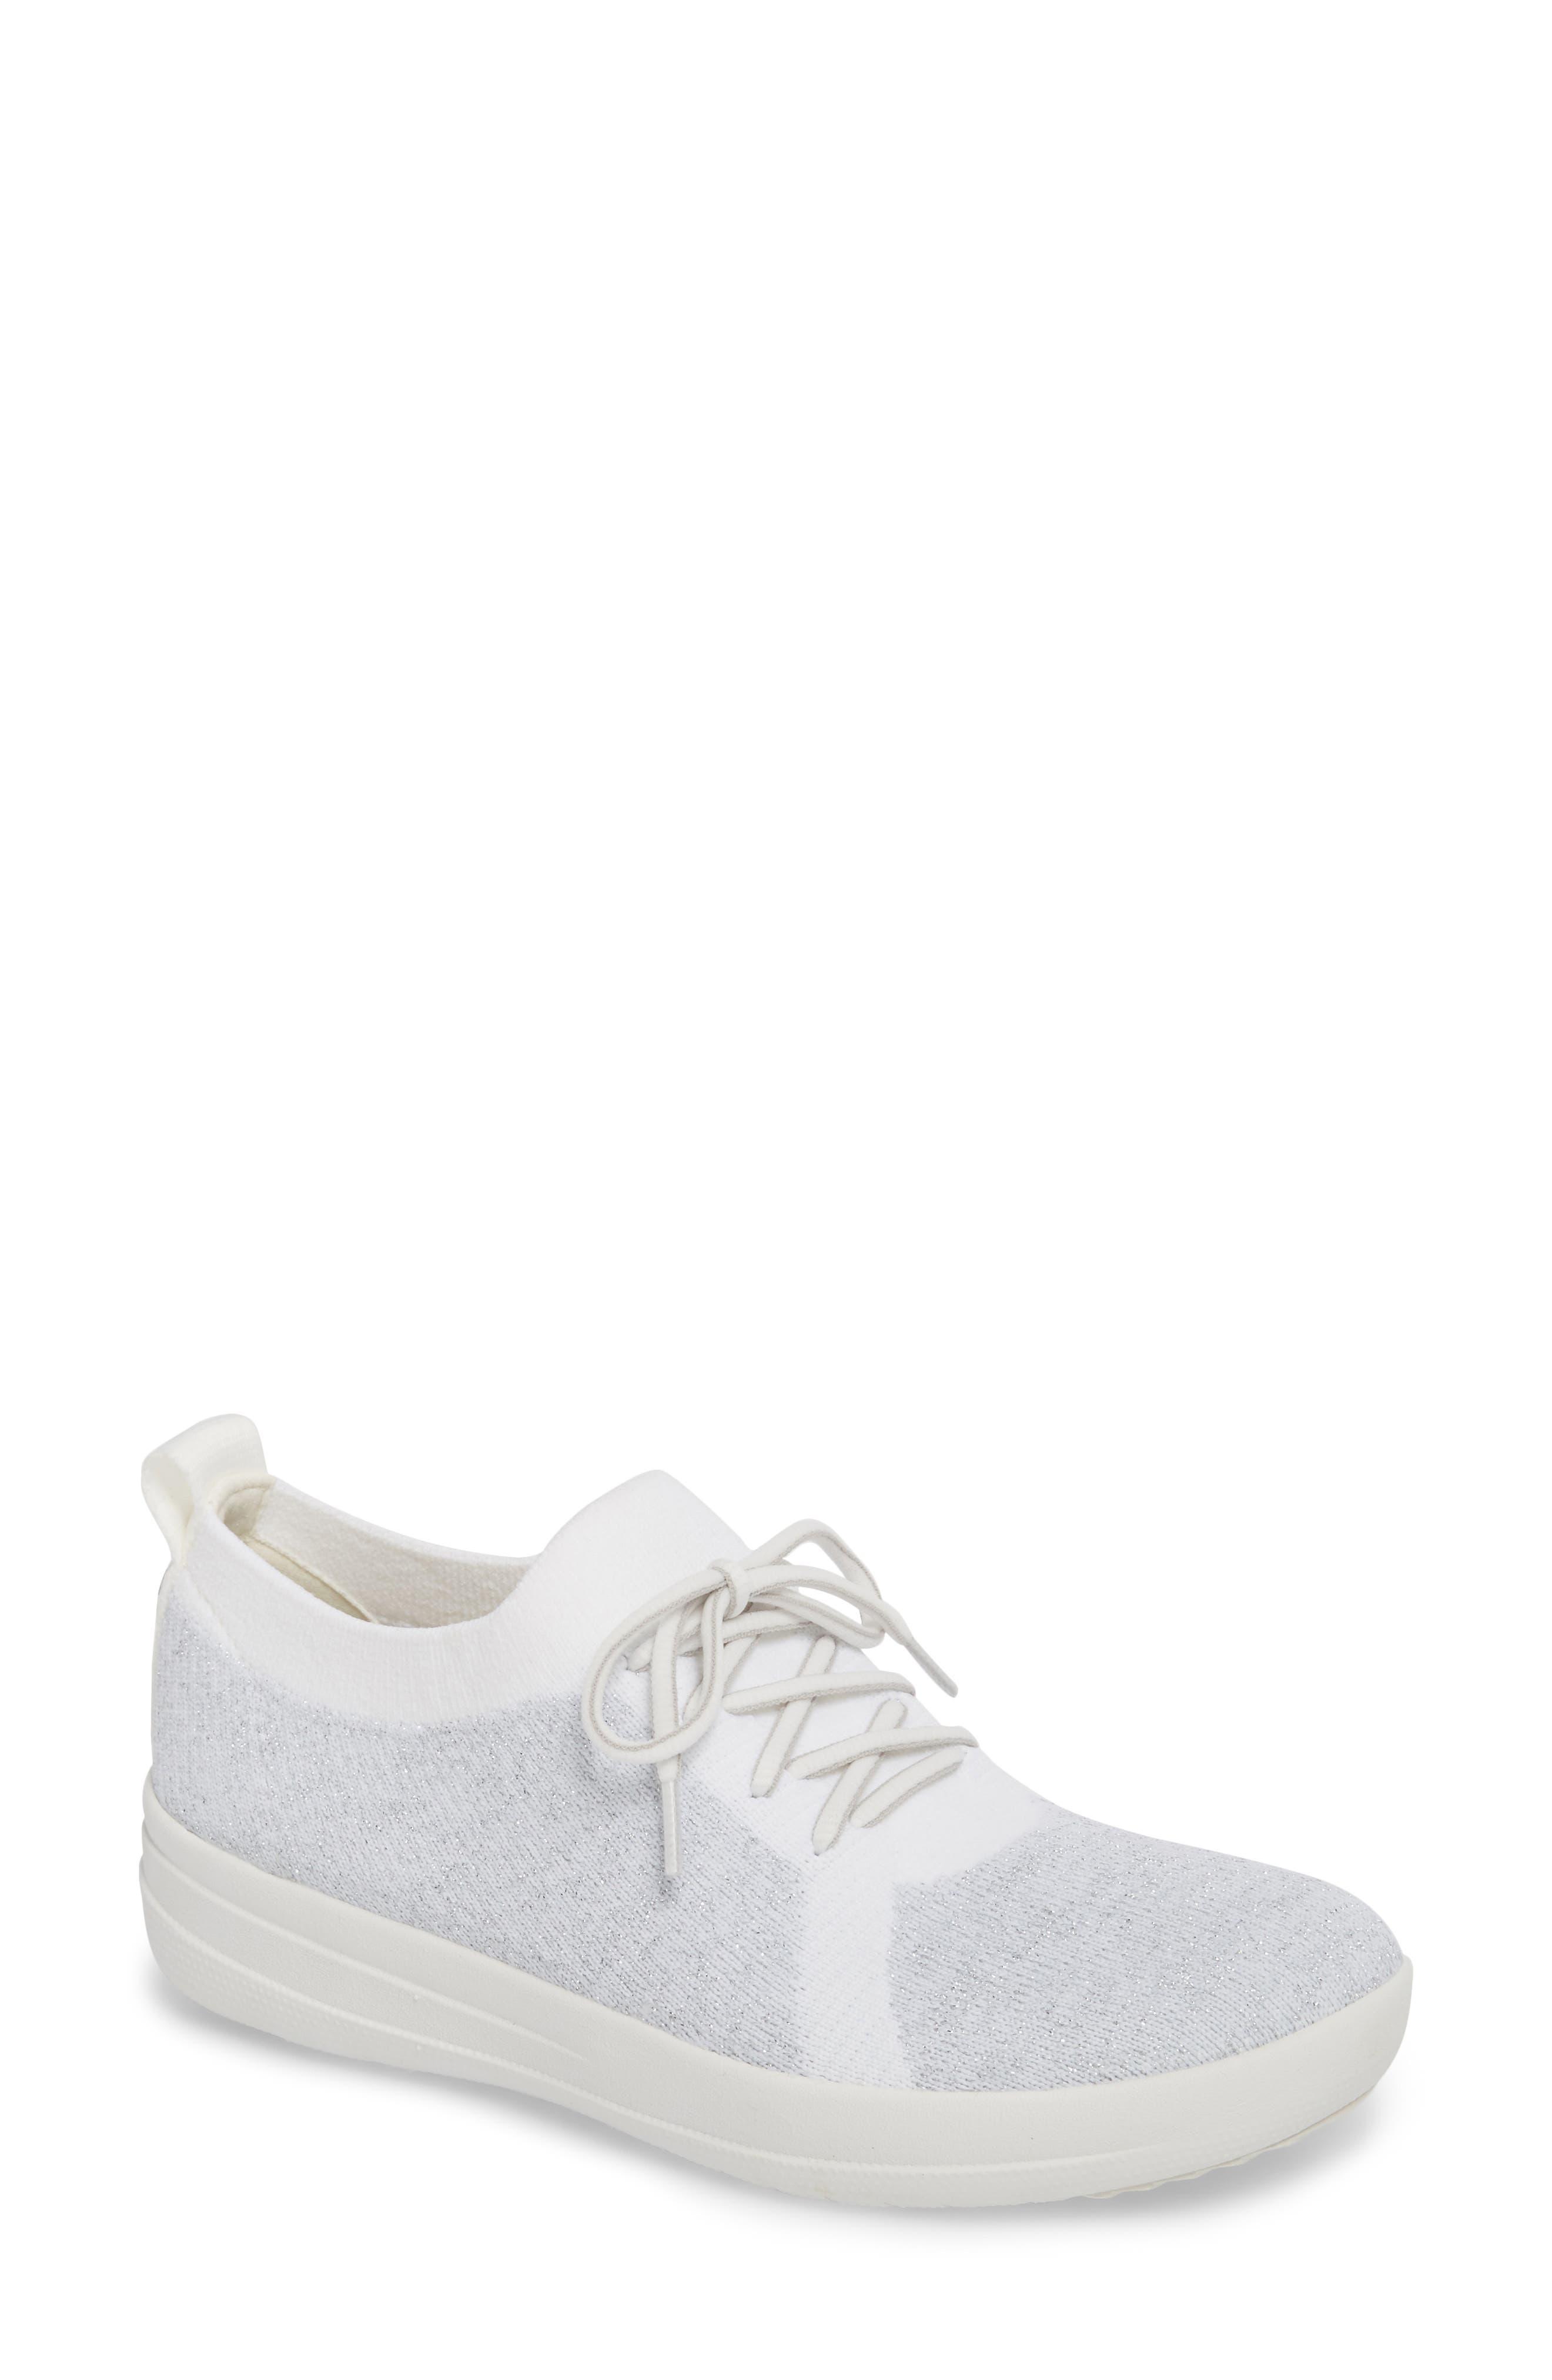 FITFLOP,                             Uberknit<sup>™</sup> F-Sporty Sneaker,                             Main thumbnail 1, color,                             METALLIC SILVER/ URBAN WHITE